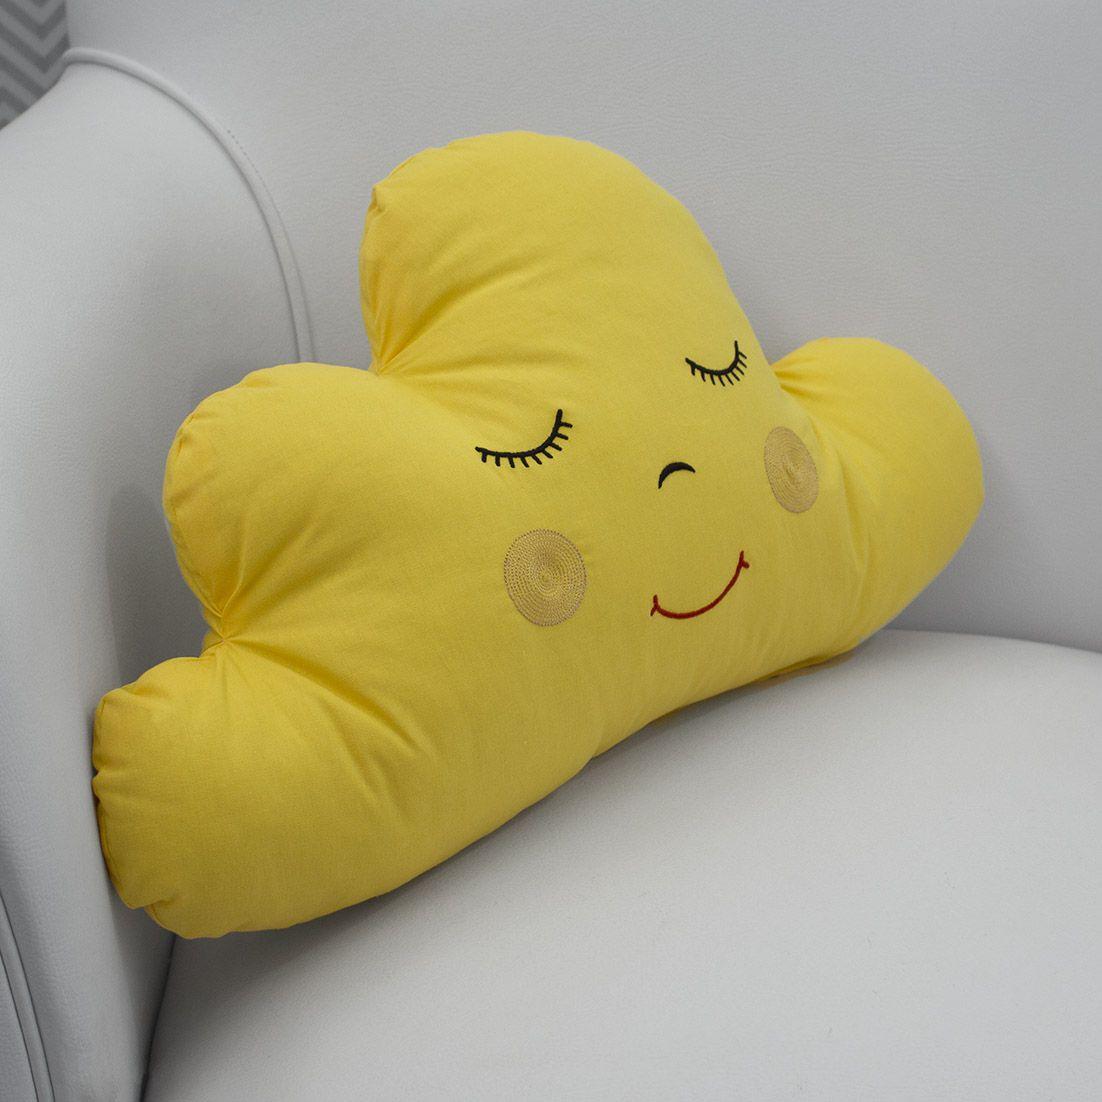 Almofada Nuvem - Amarela